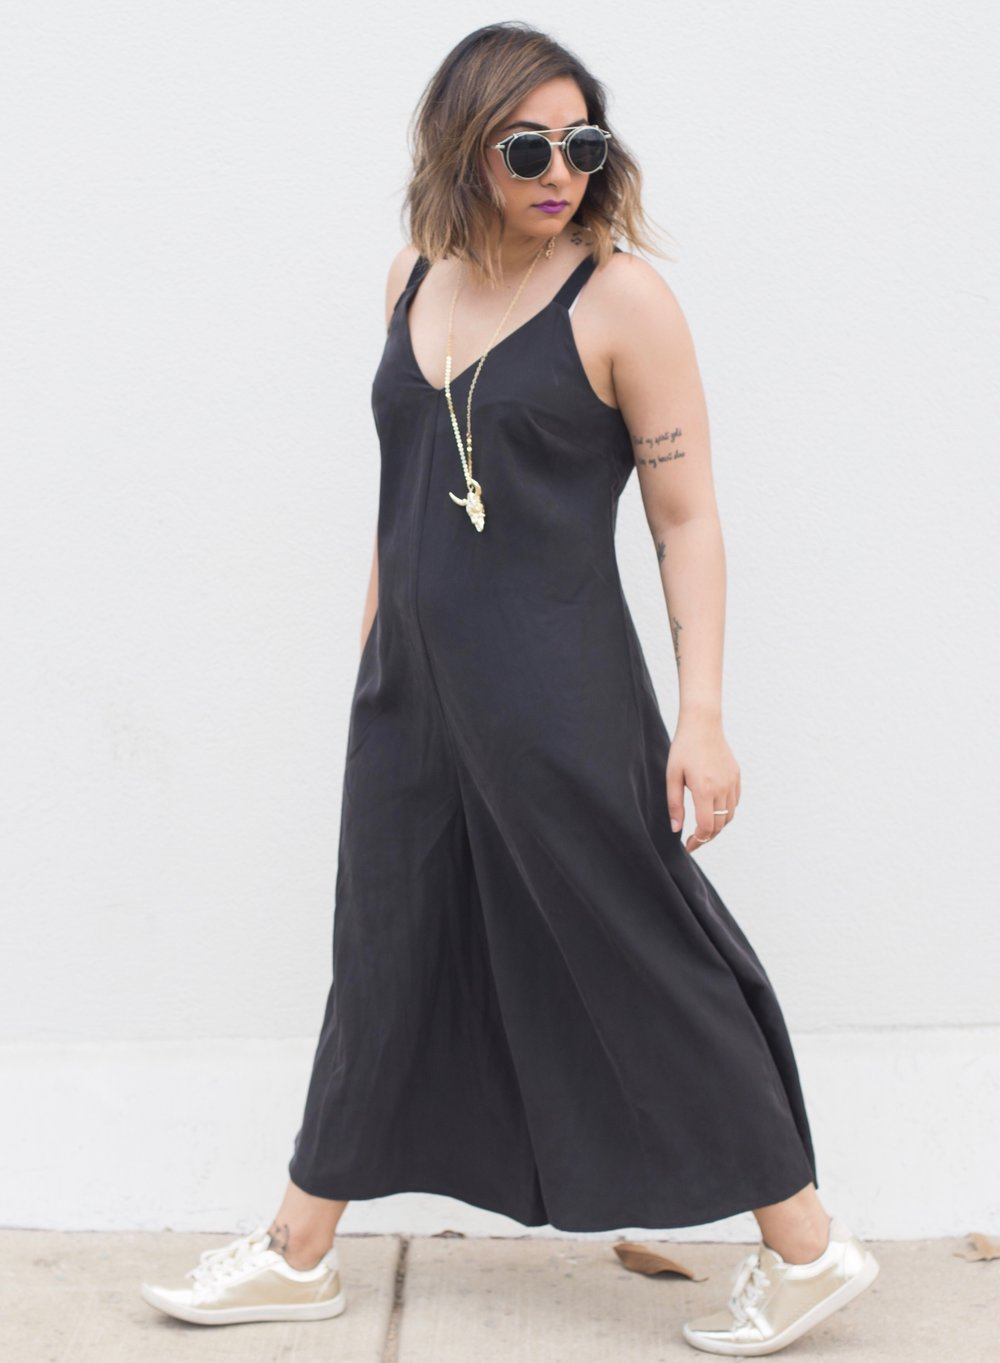 ASOS Black Culottes Jumpsuit | Zara Gold Sneakers 5.JPG